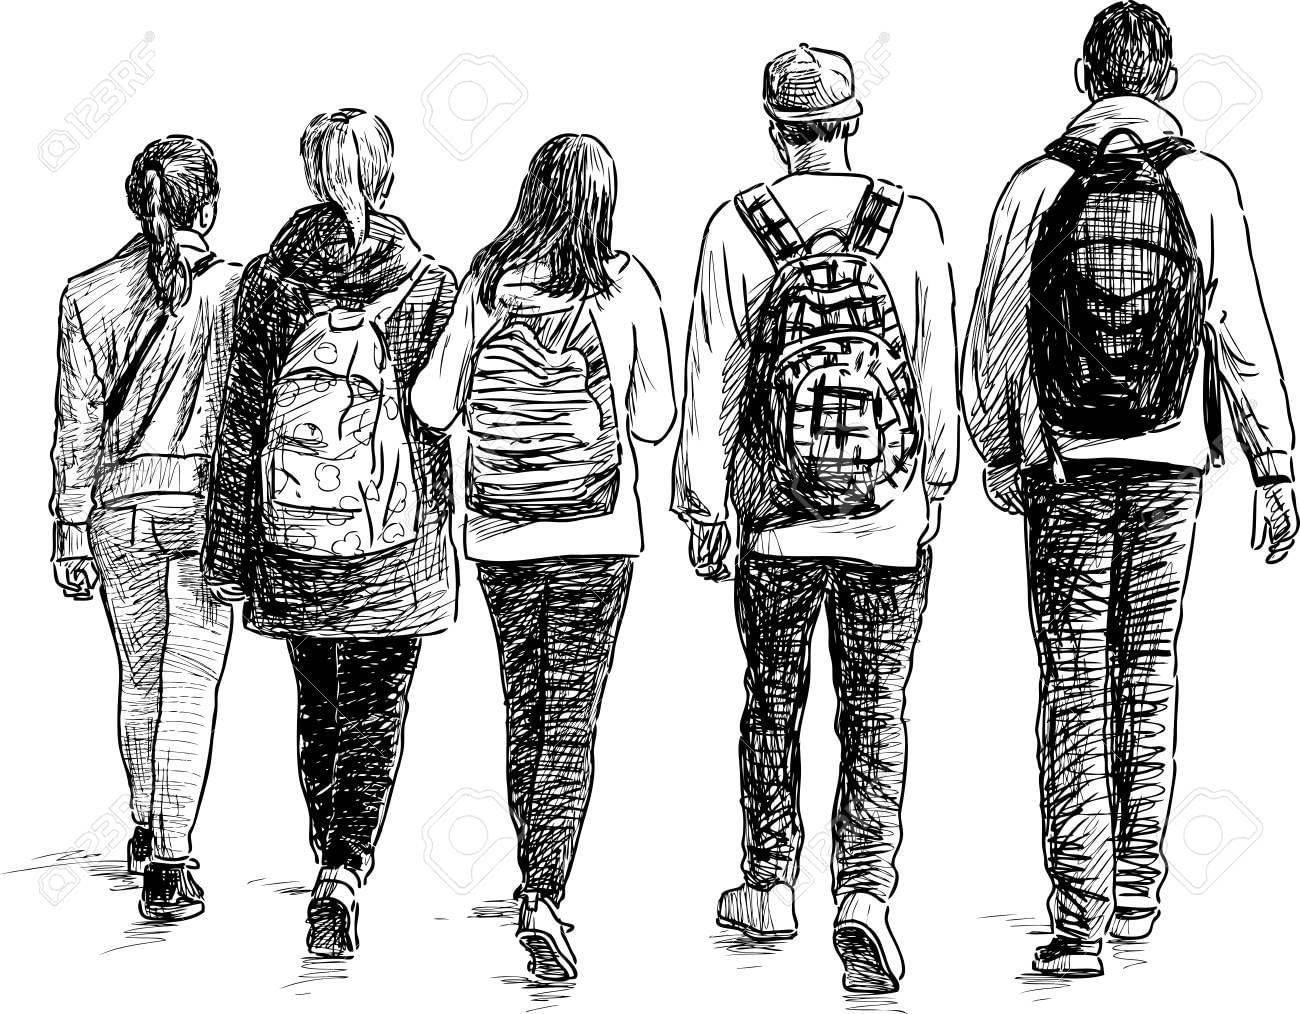 strengthing student's immunity with CBD